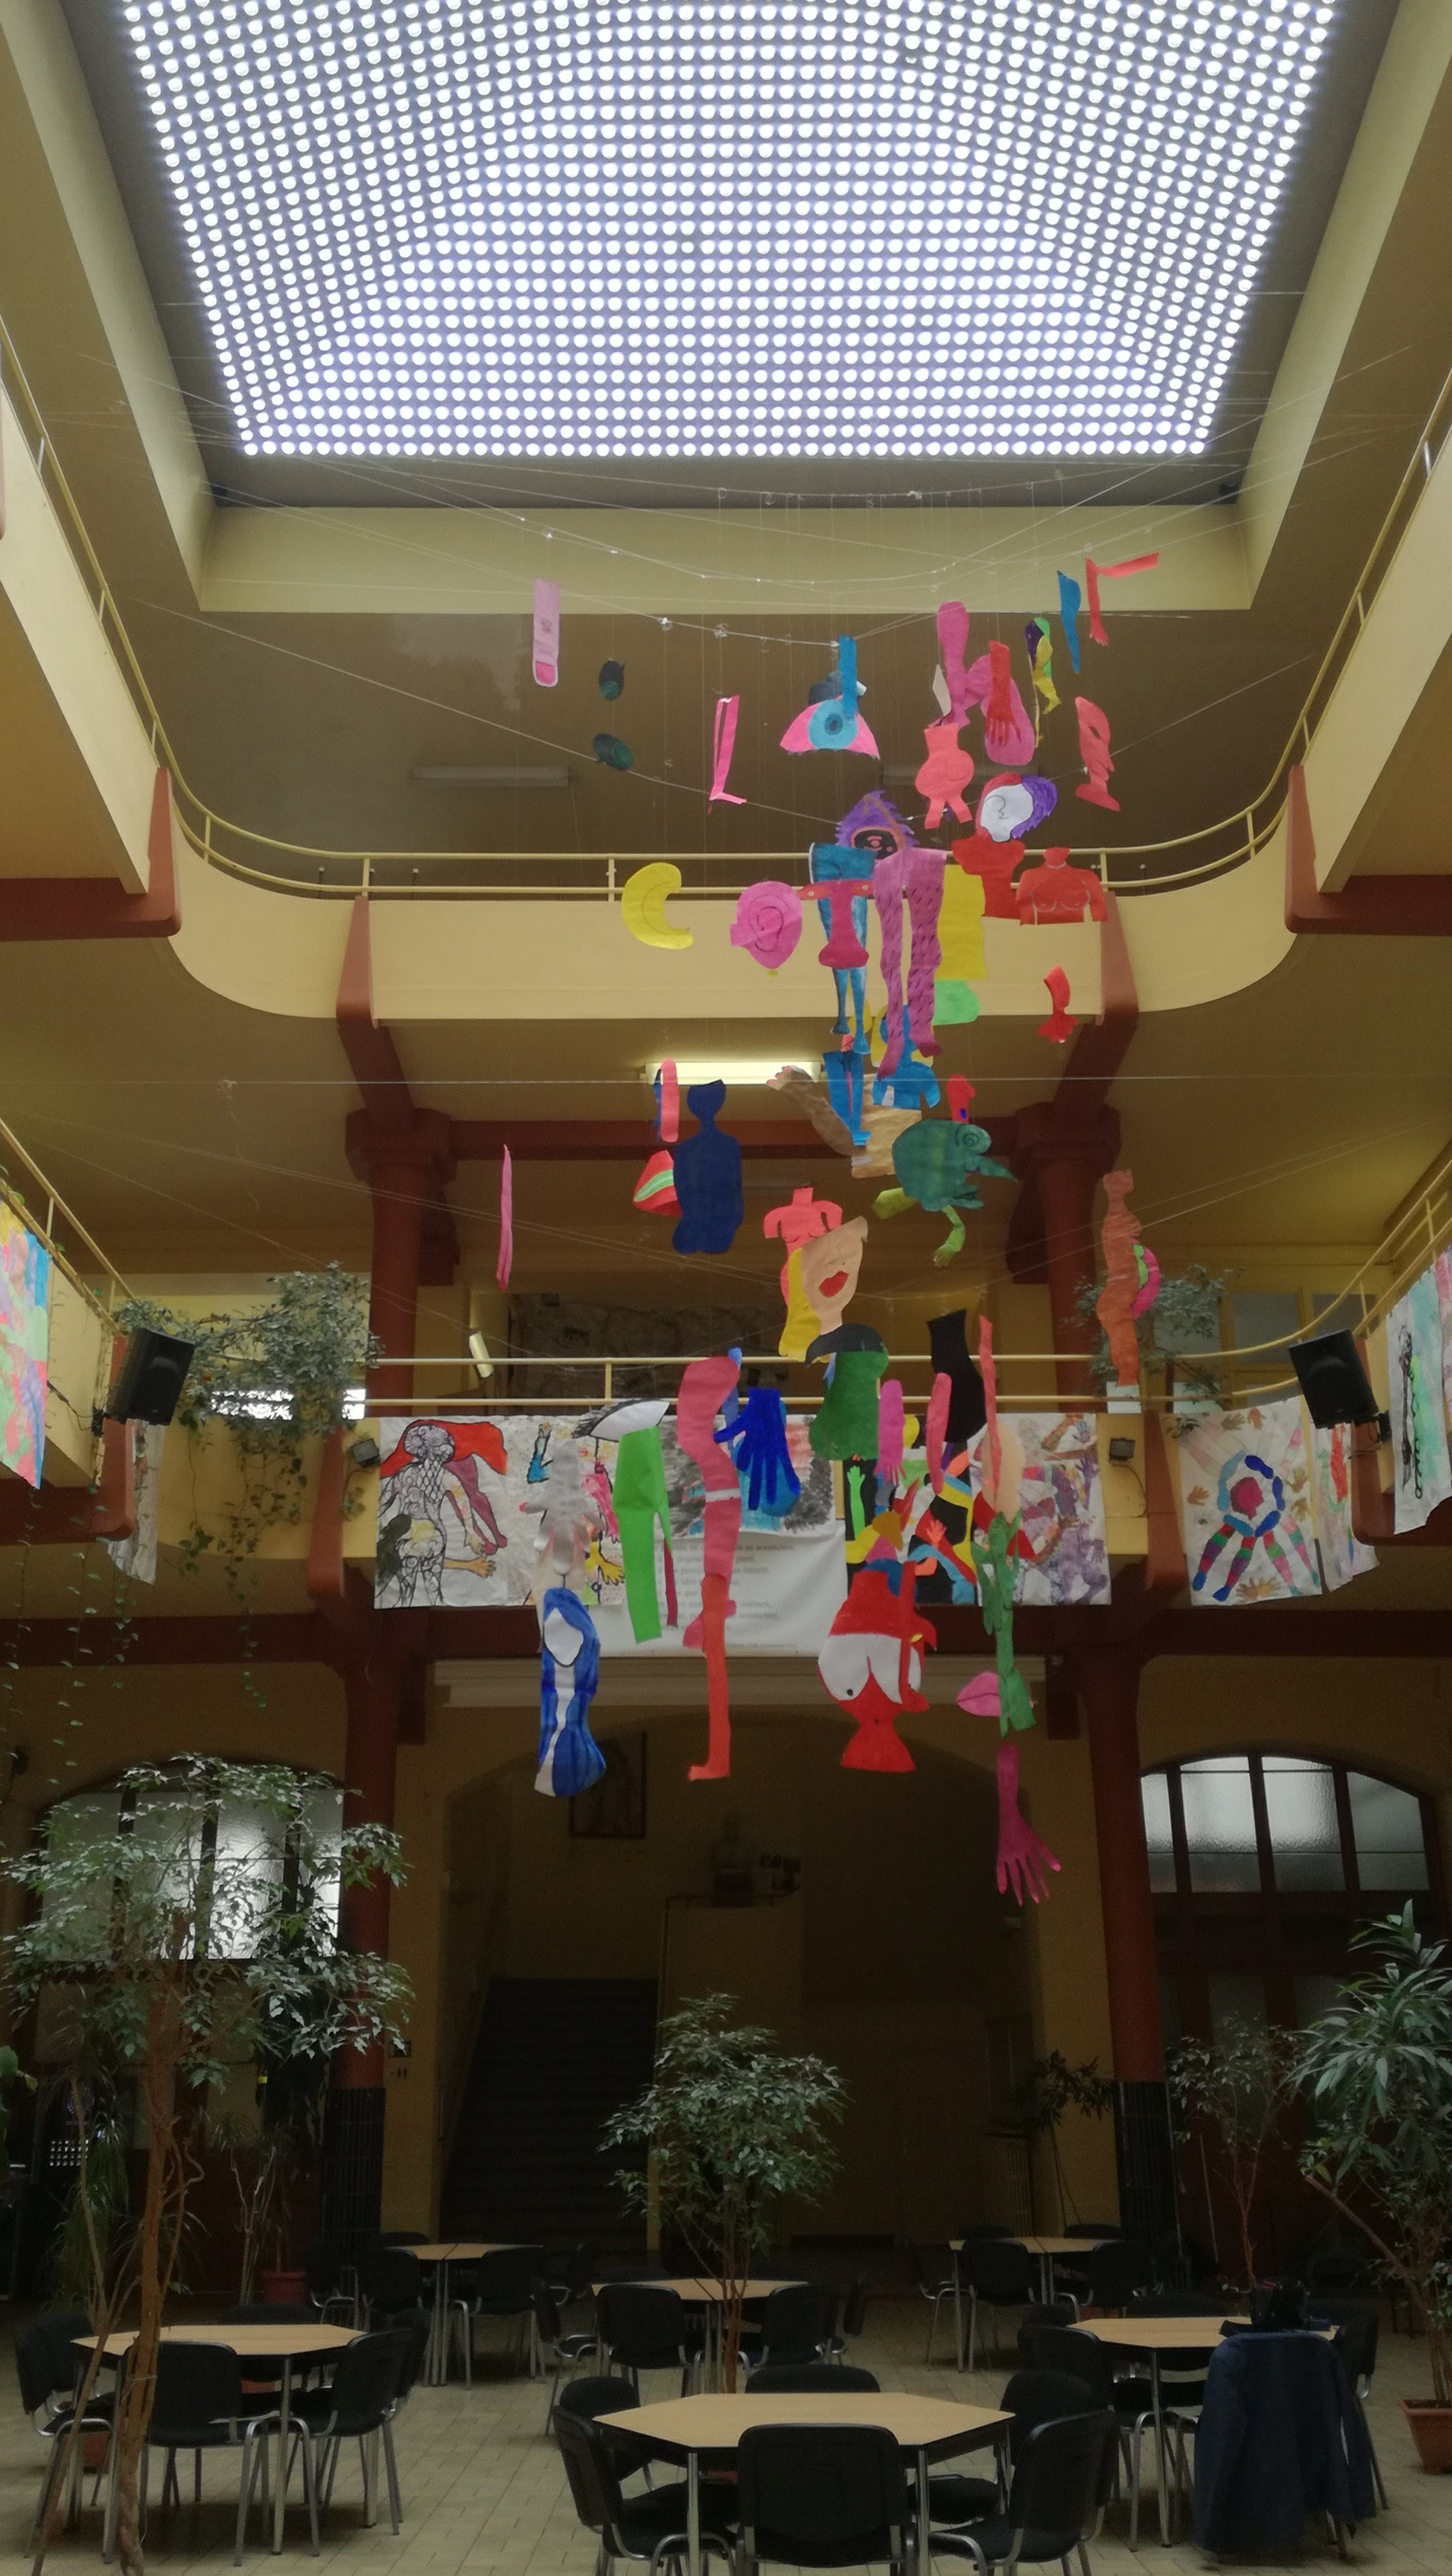 30 avril 2018 – Haute Ecole Francisco Ferrer – Atrium – Bruxelles